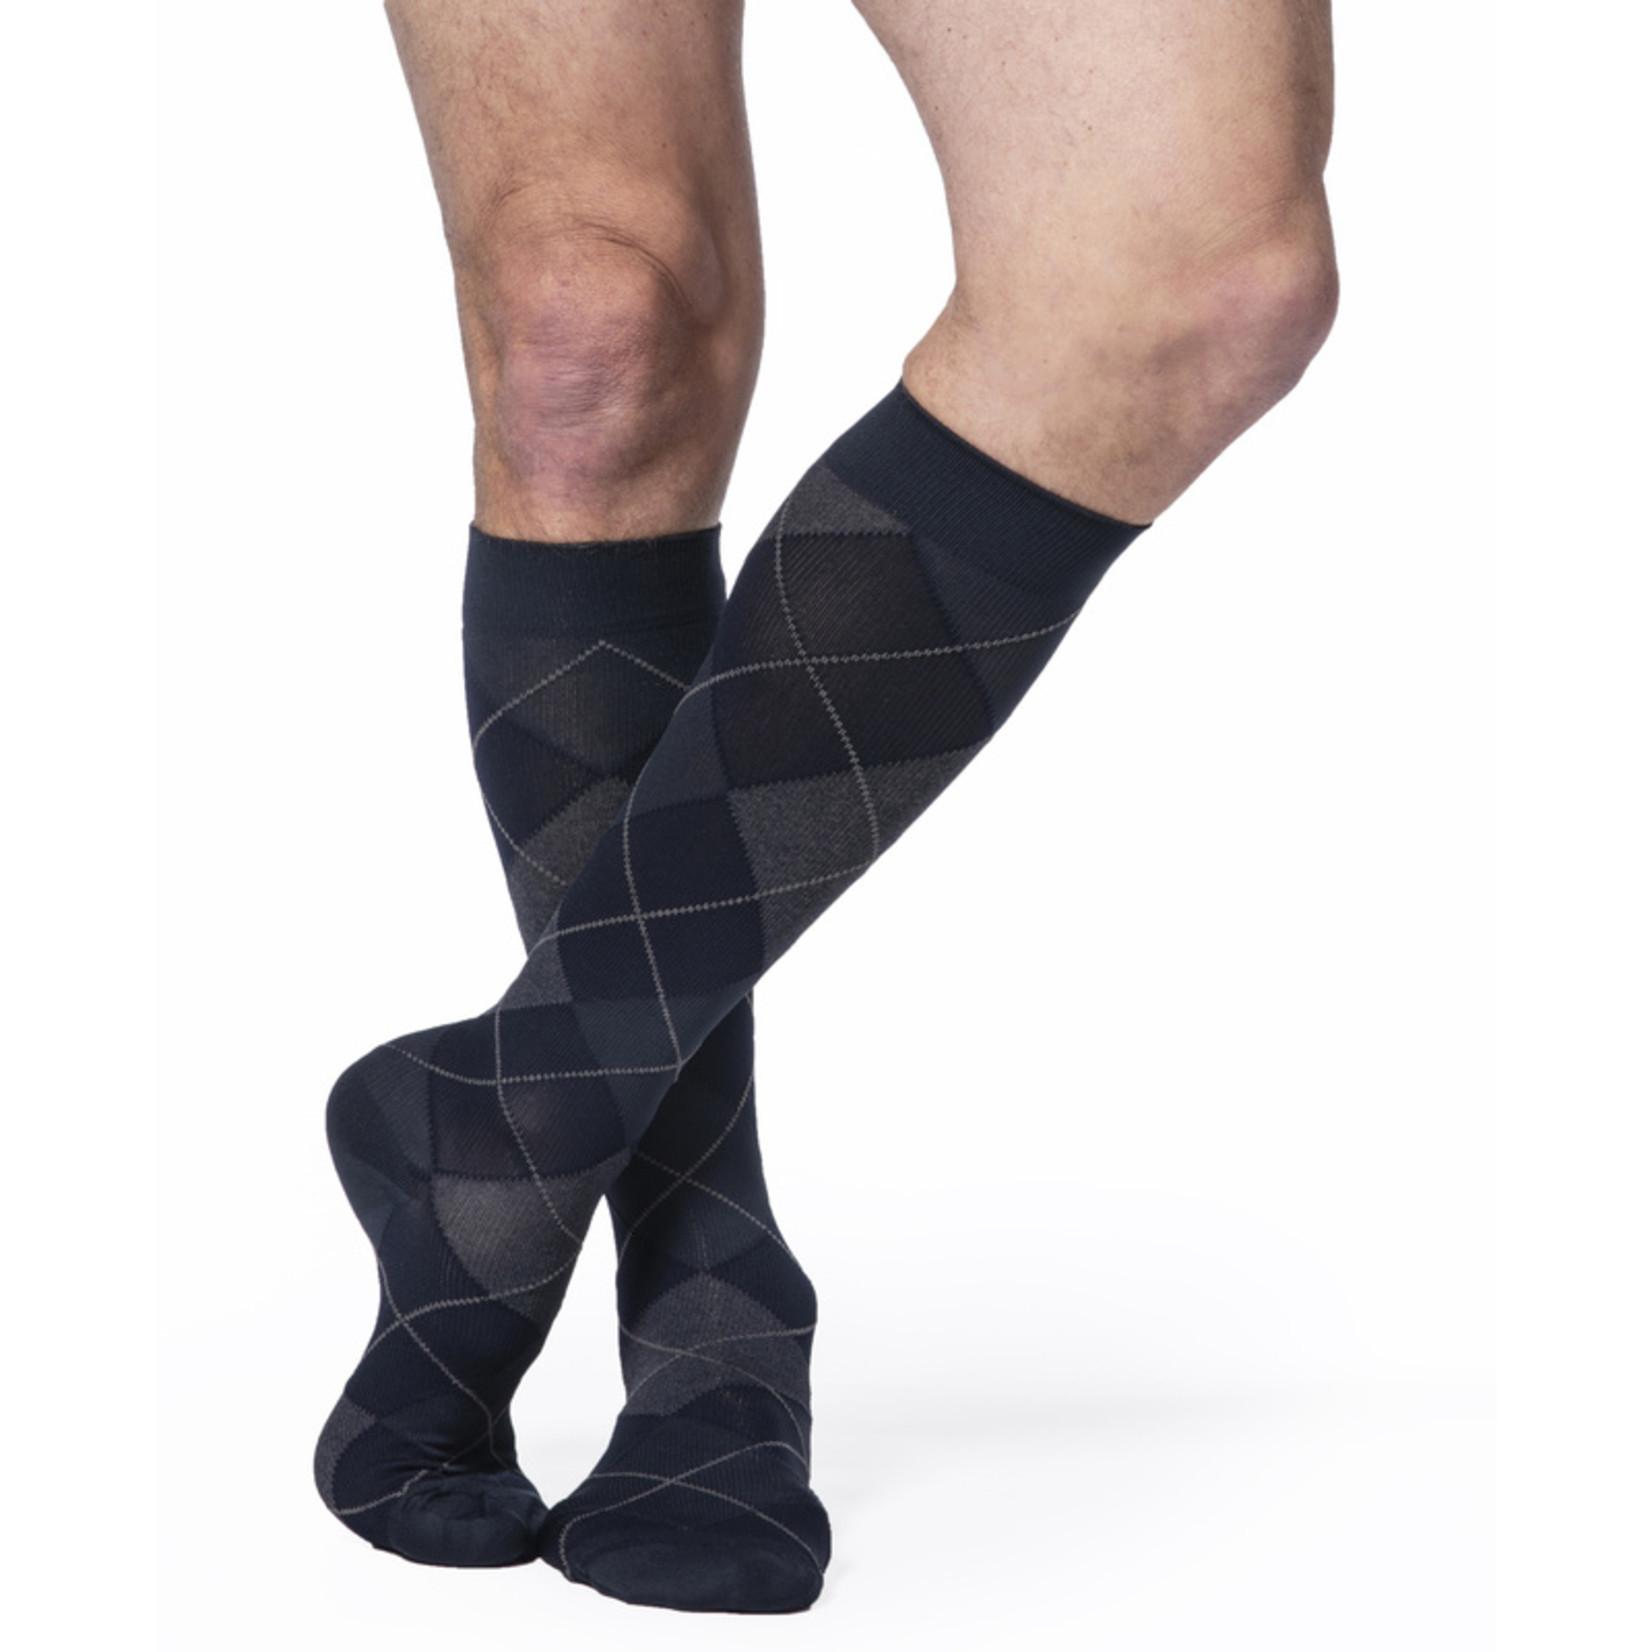 SIGVARIS Men's Style Microfiber Patterns Calf 20-30mmHg